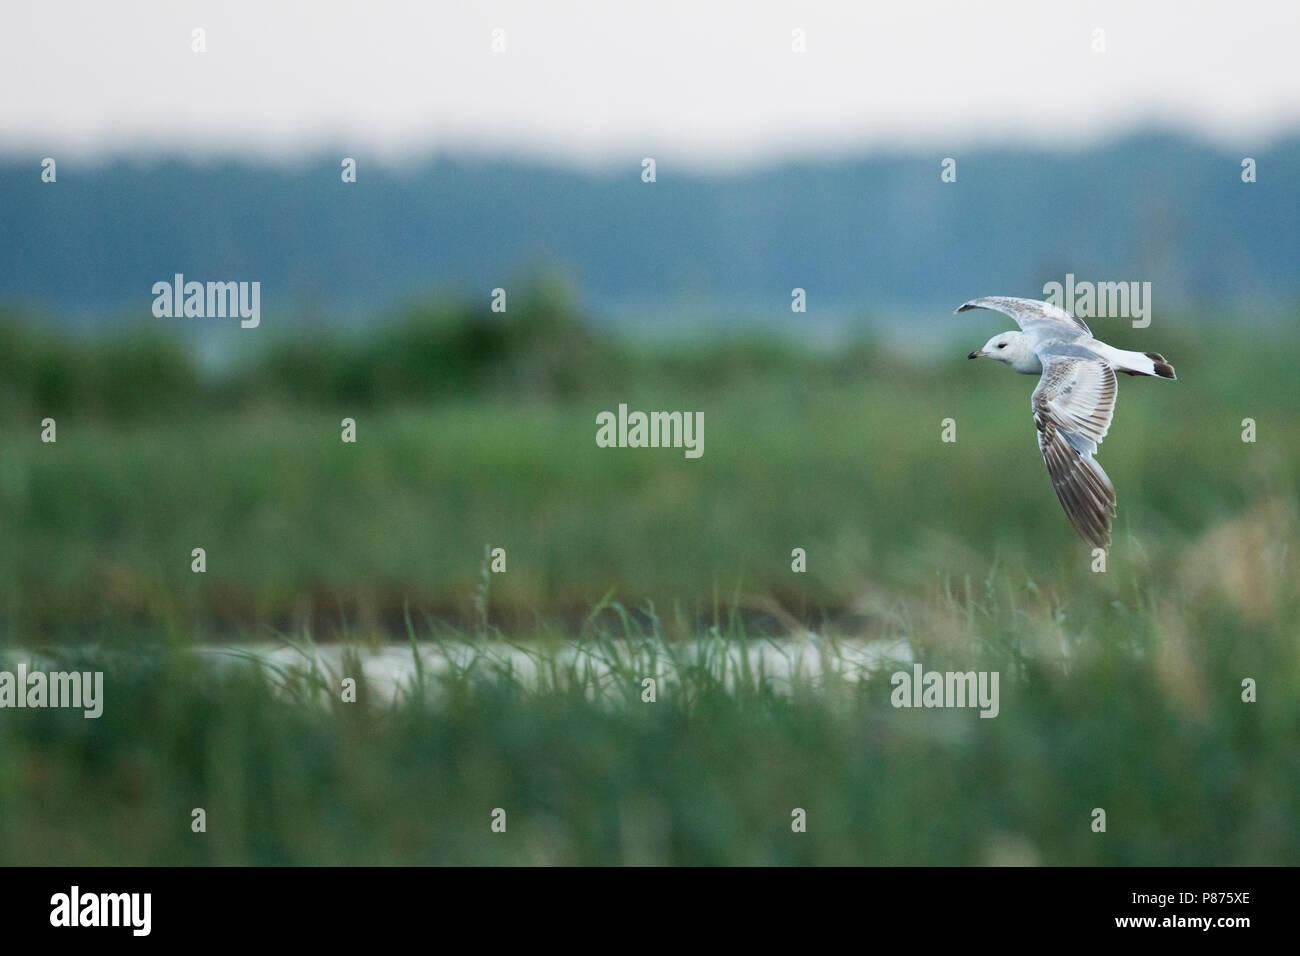 Stormmeeuw, Mew Gull, Larus canus ssp. heinei, Russia (Tscheljabinsk), 2nd cy - Stock Image